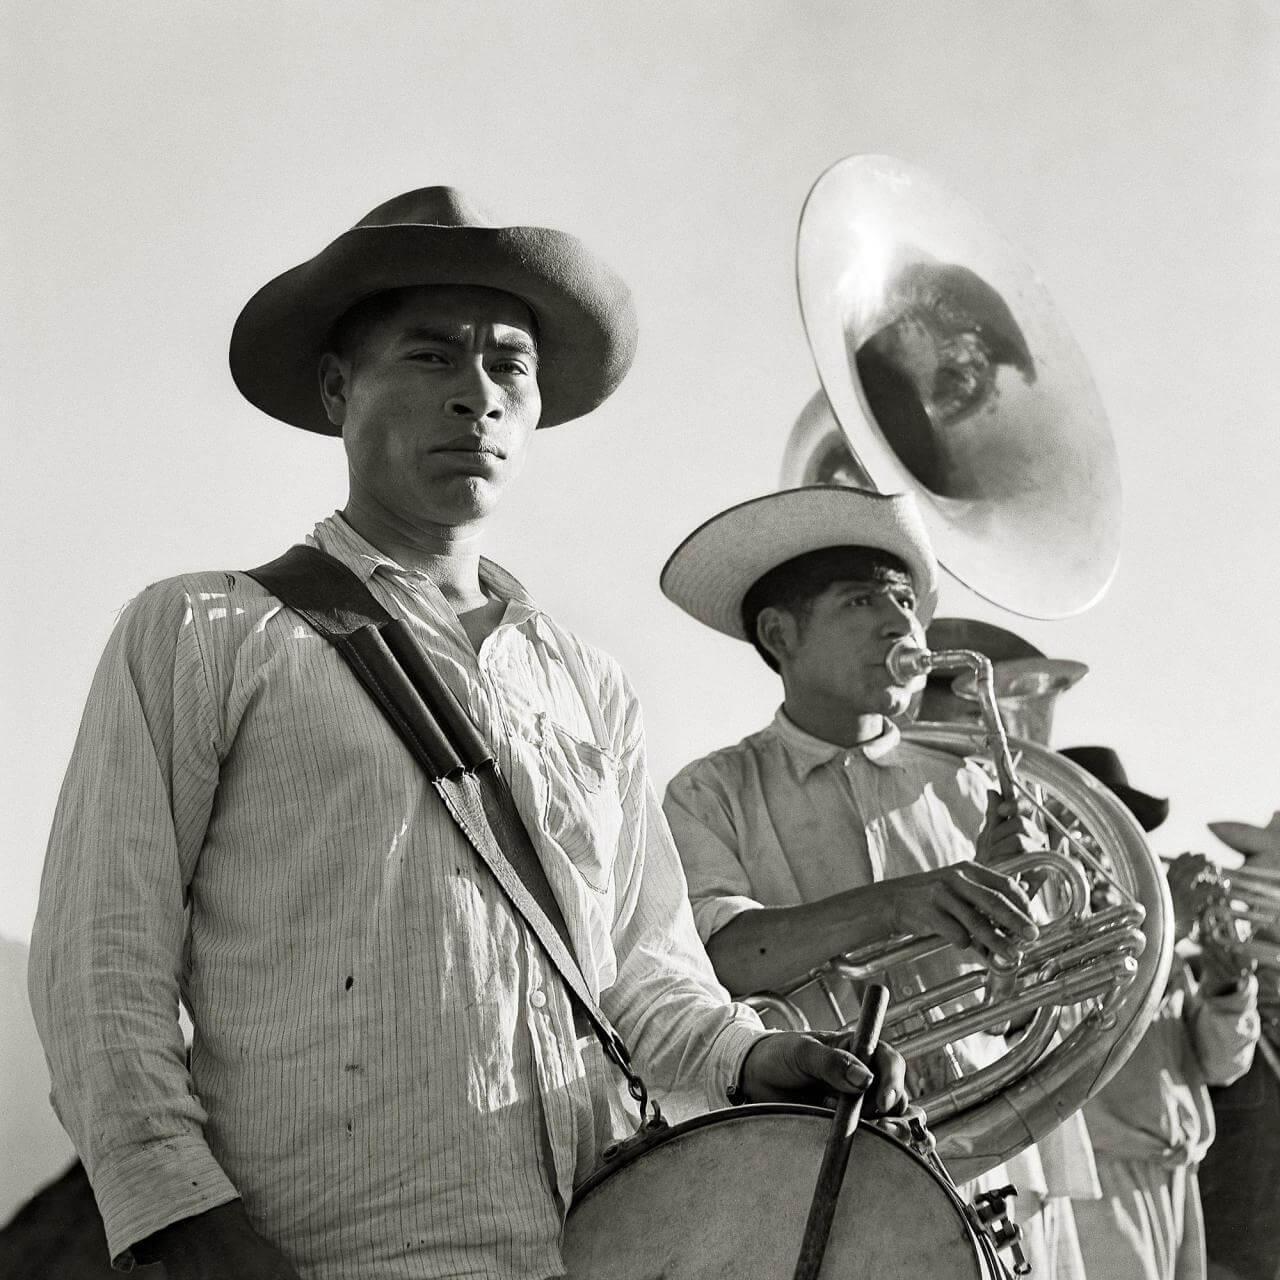 Músicos en Tlahuitoltepec | Juan Rulfo. El fotógrafo Juan Rulfo | Museo Amparo, Puebla